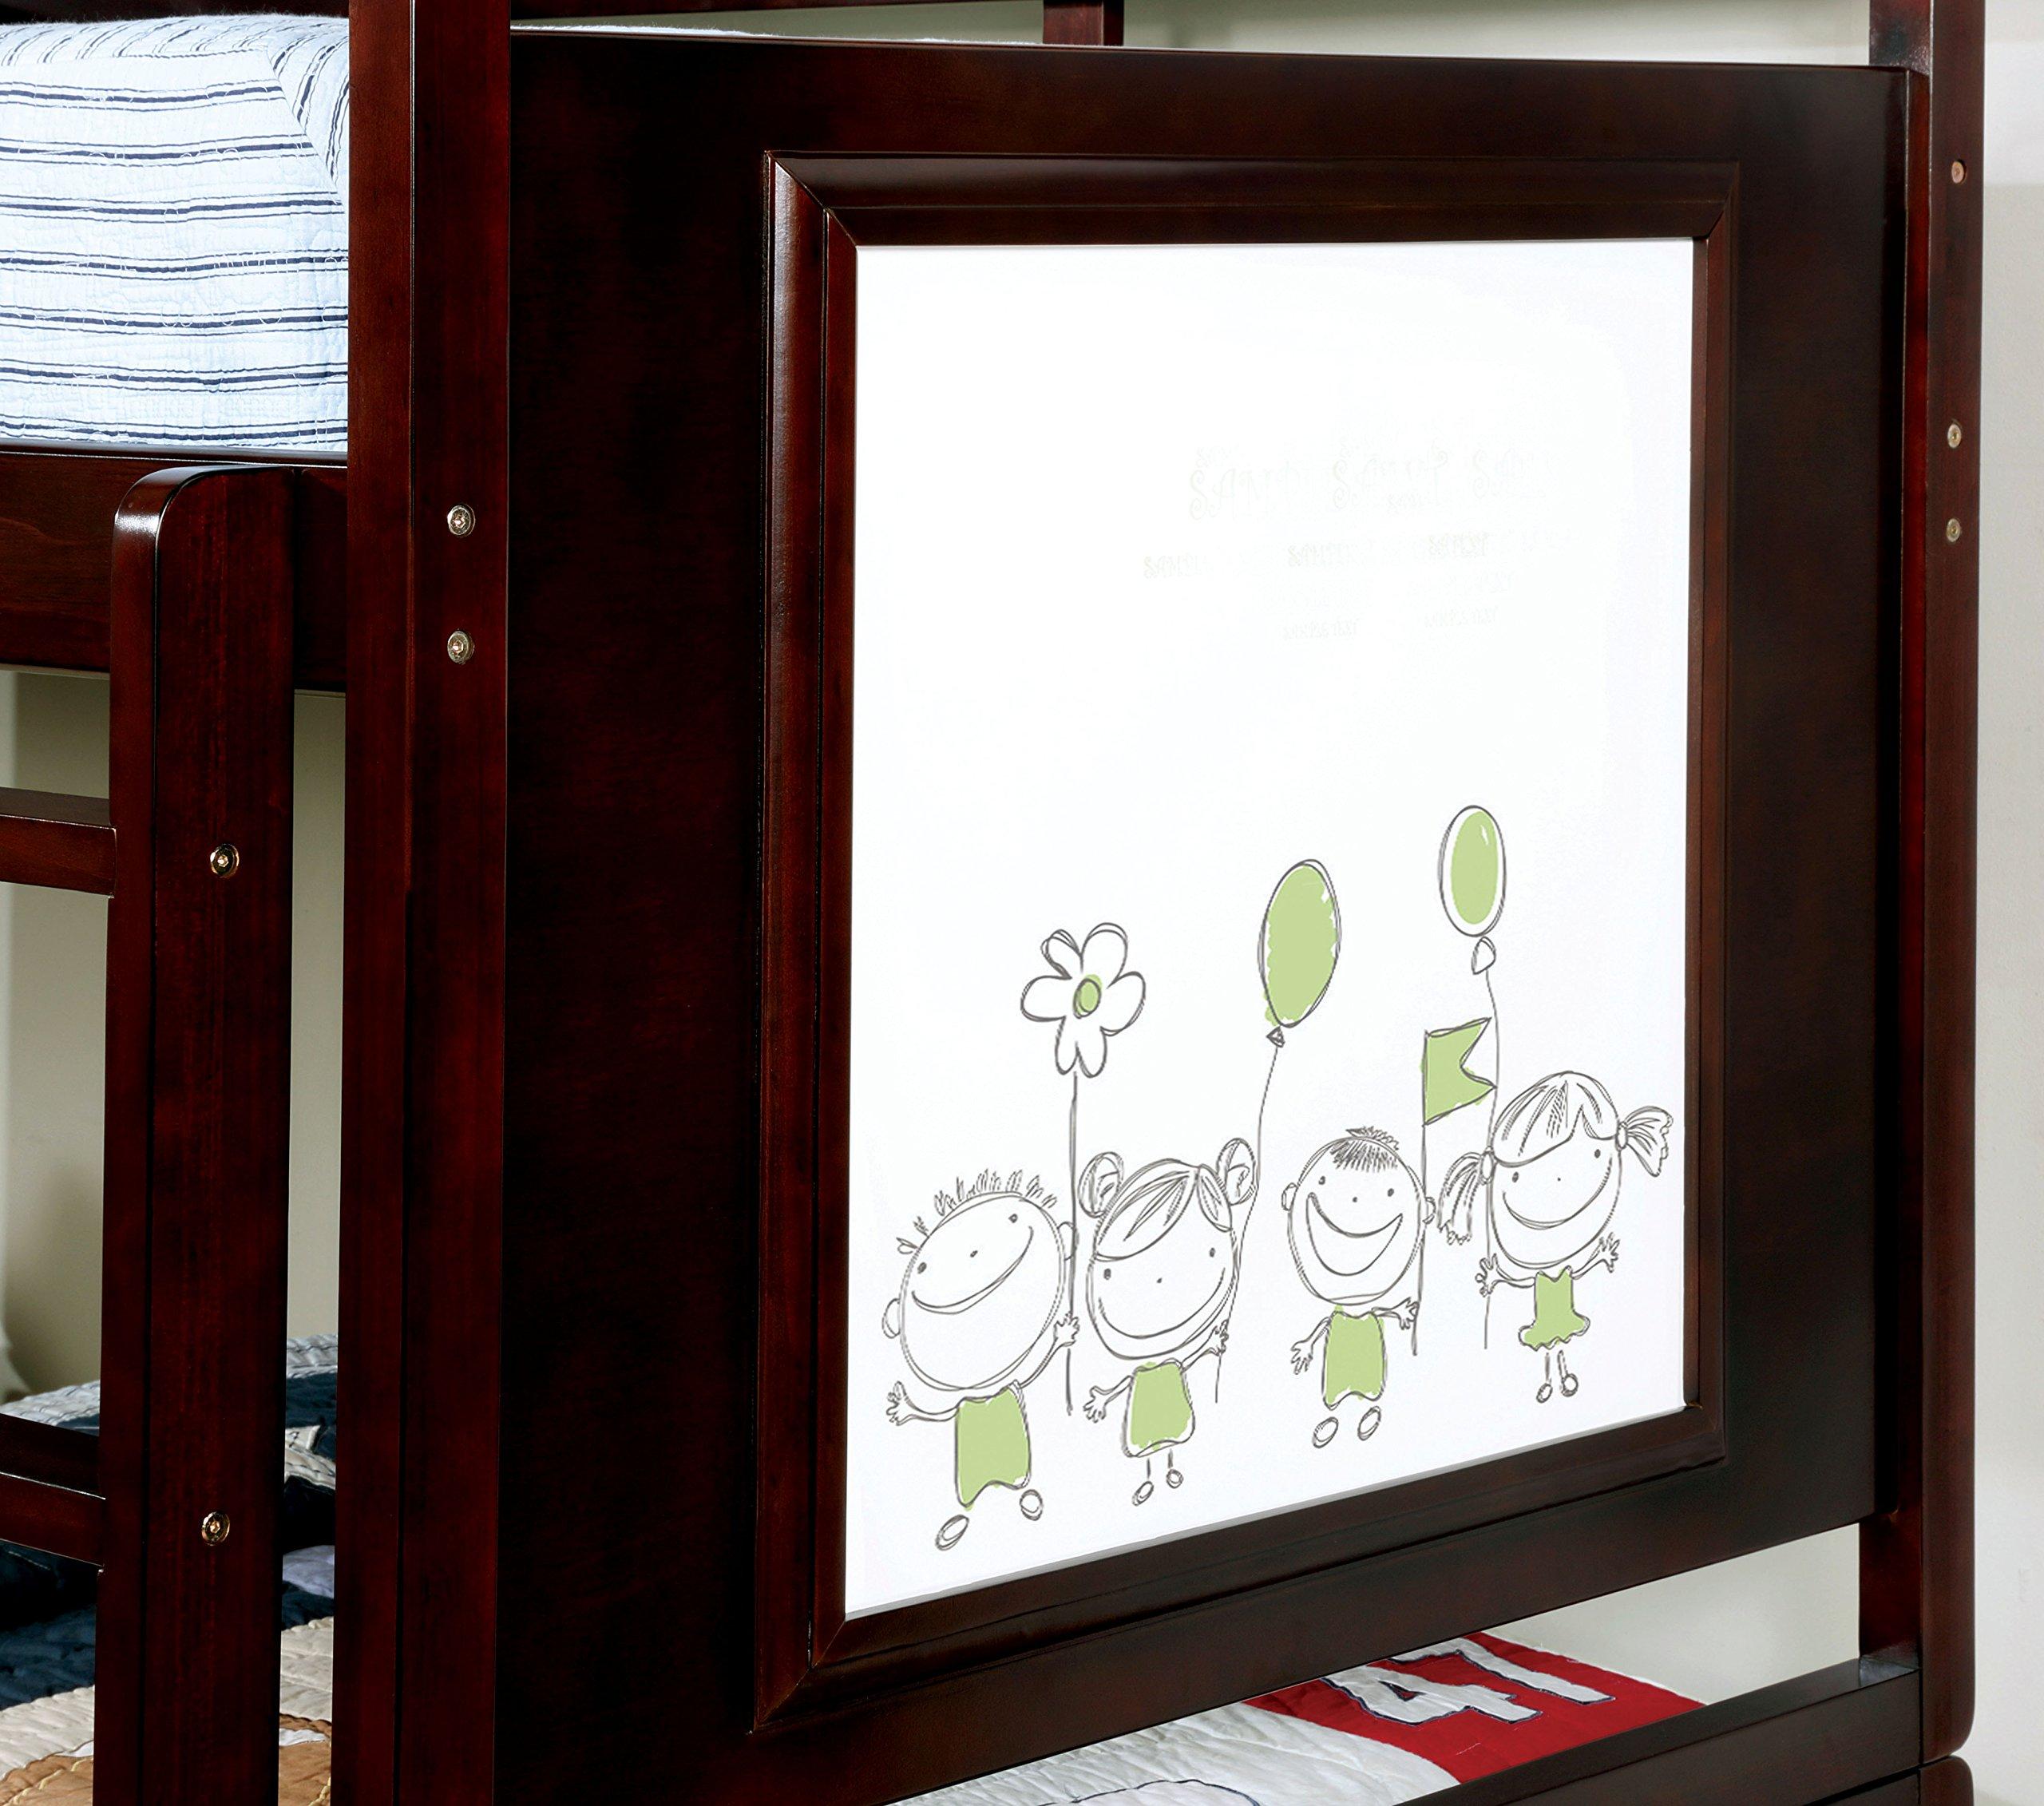 HOMES: Inside + Out IDF-BK901EX Indio Bunk Bed Childrens Frames, Twin / Twin, Dark Walnut